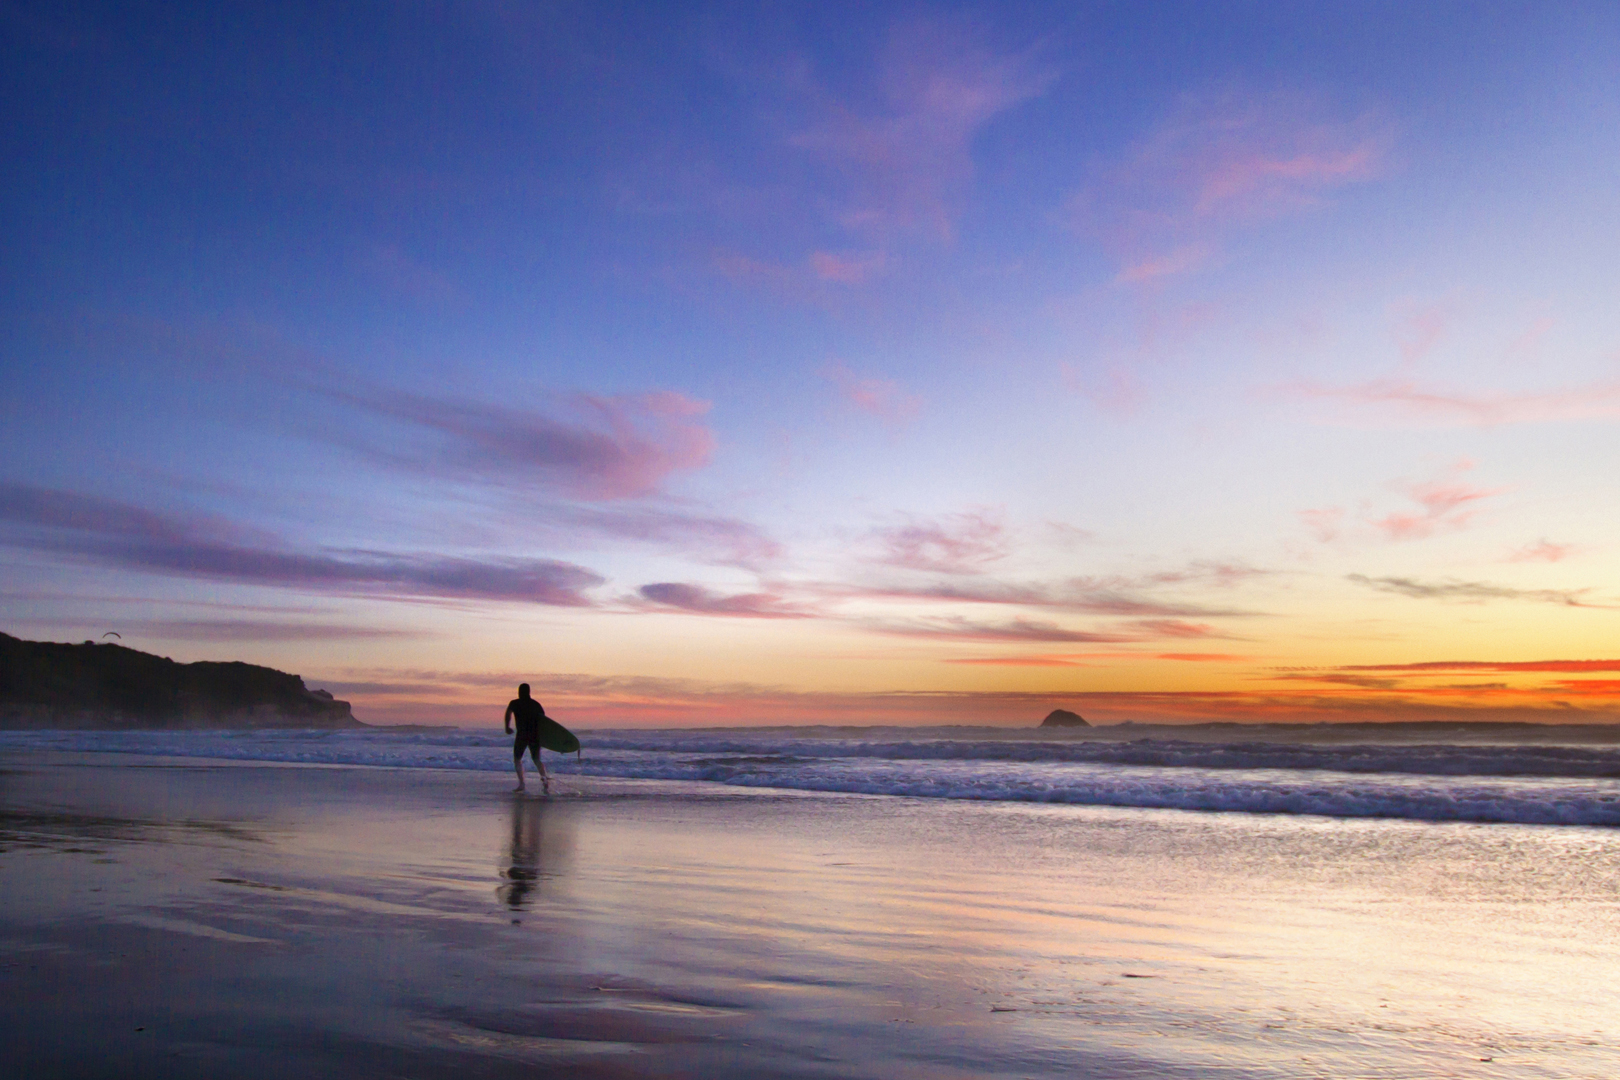 Evening Surfer